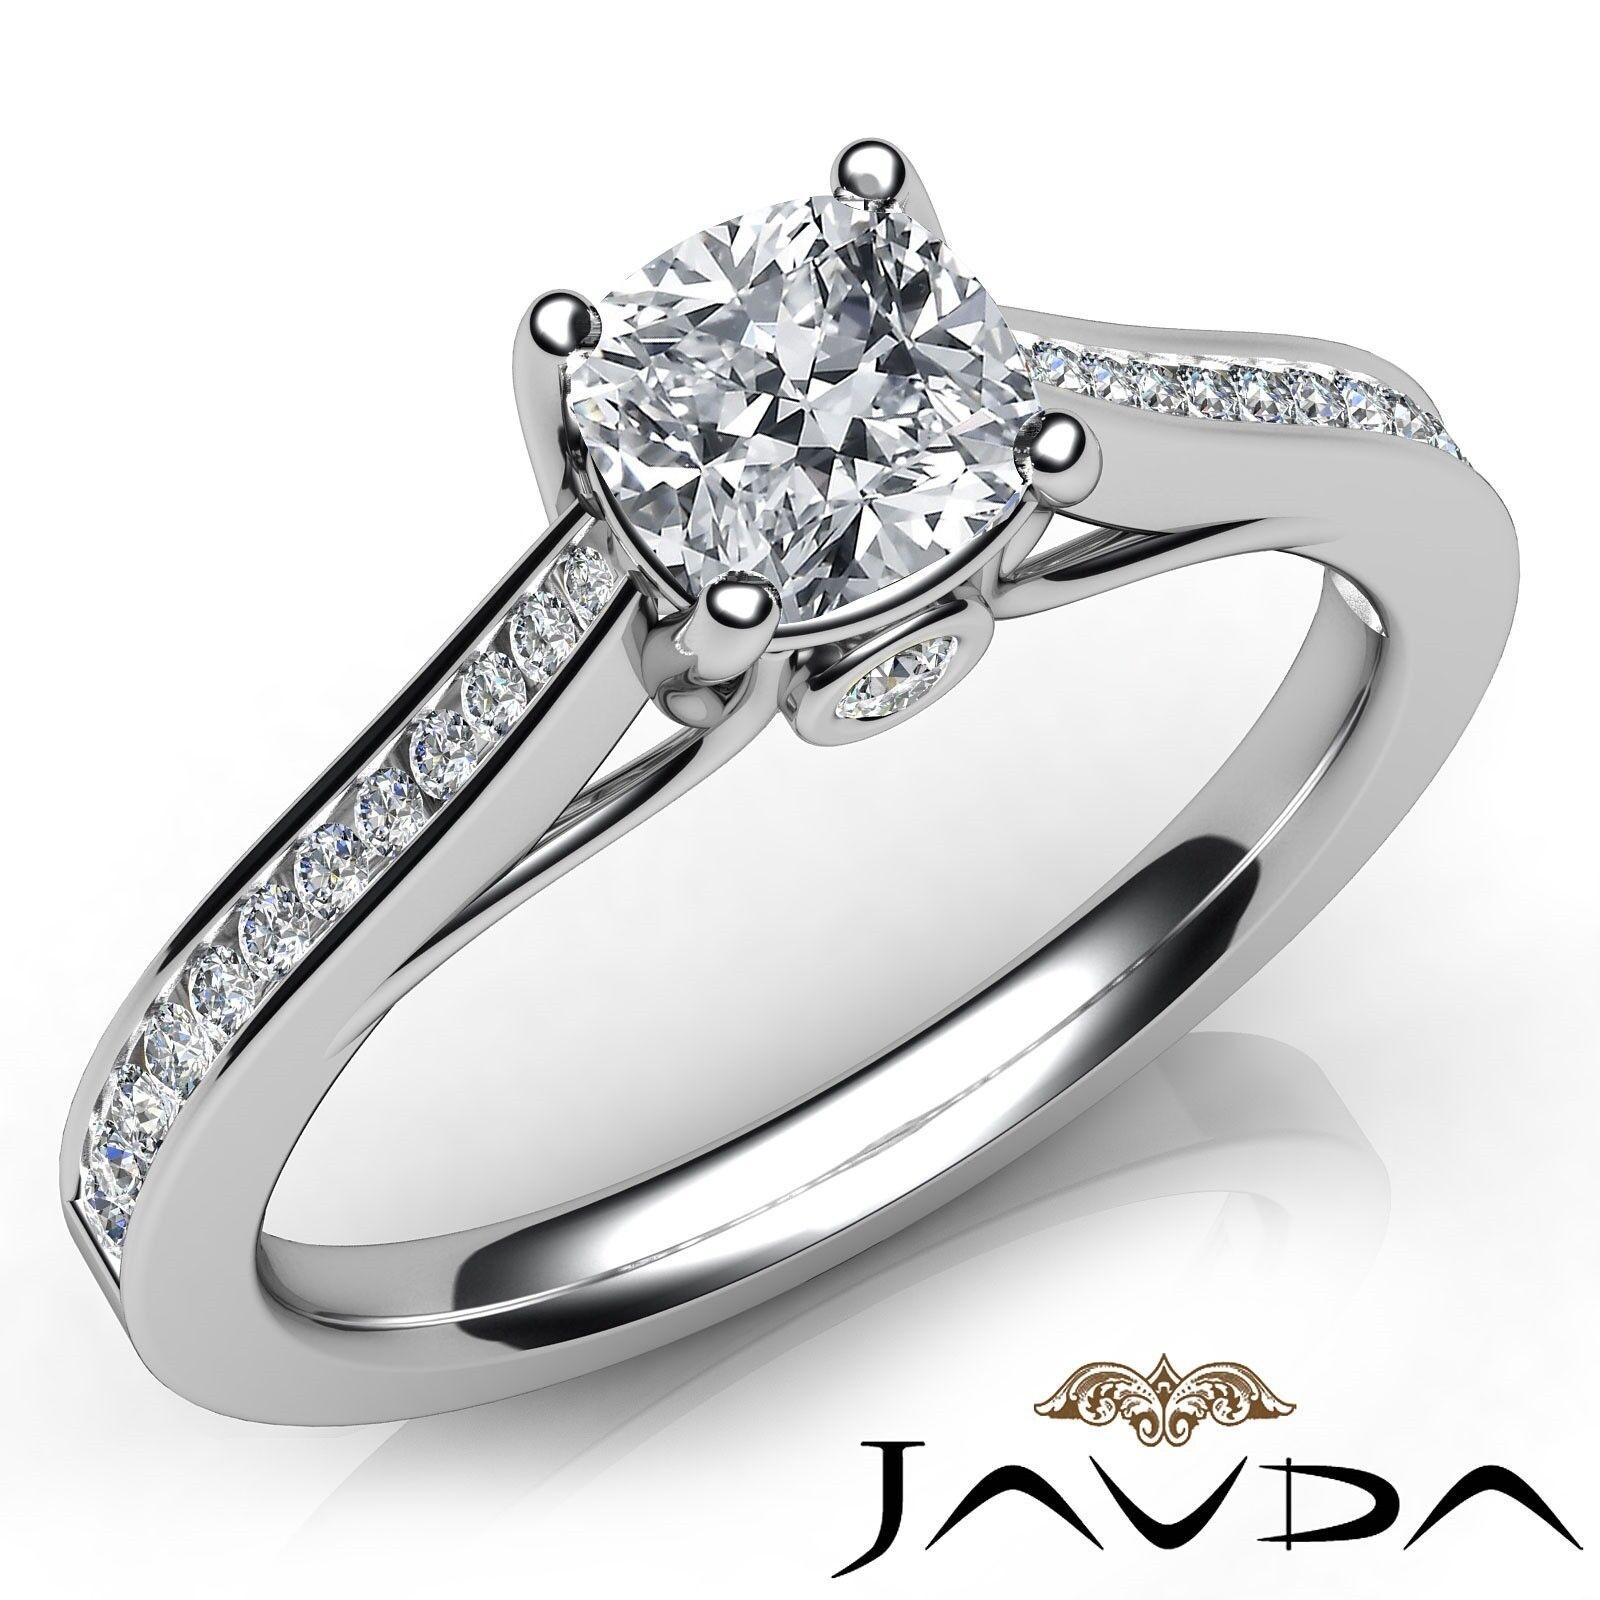 0.81ctw Channel Bezel Prong Cushion Diamond Engagement Ring GIA D-VS1 White Gold